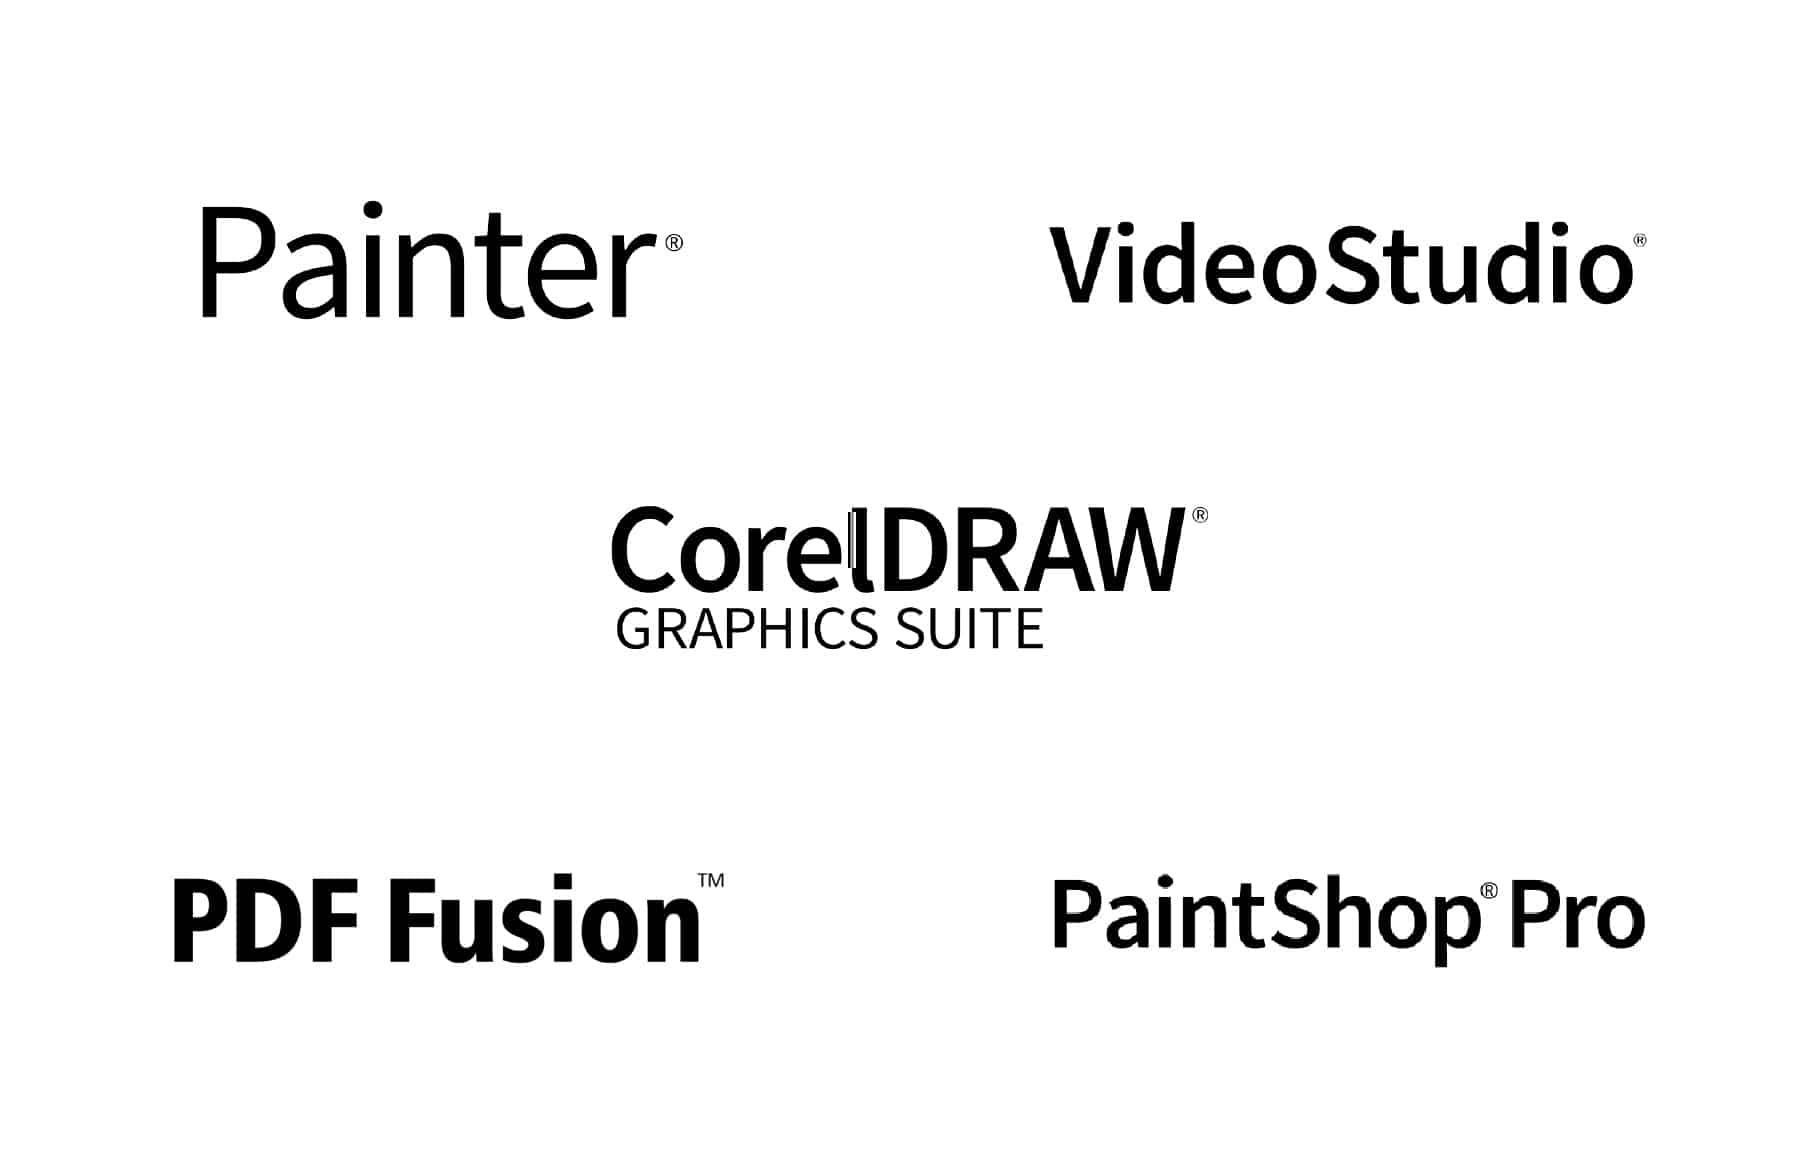 Corel Software